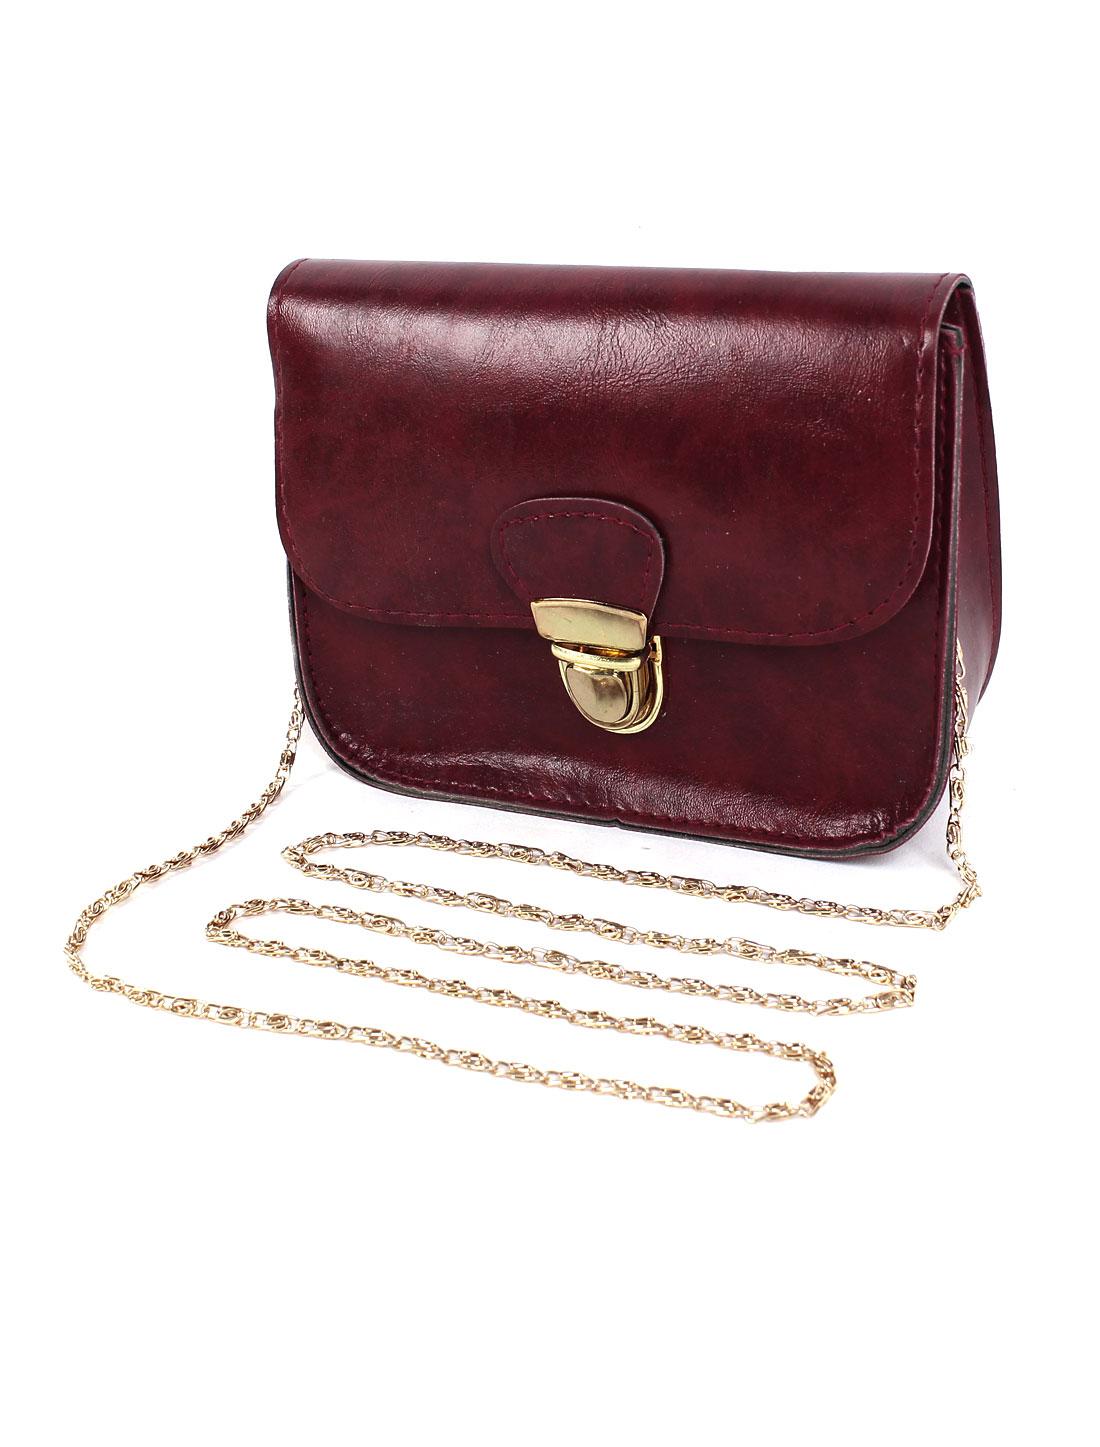 Women New Mini Cute Hasp Chain Shoulder Crossbody Messenger Bag Burgundy